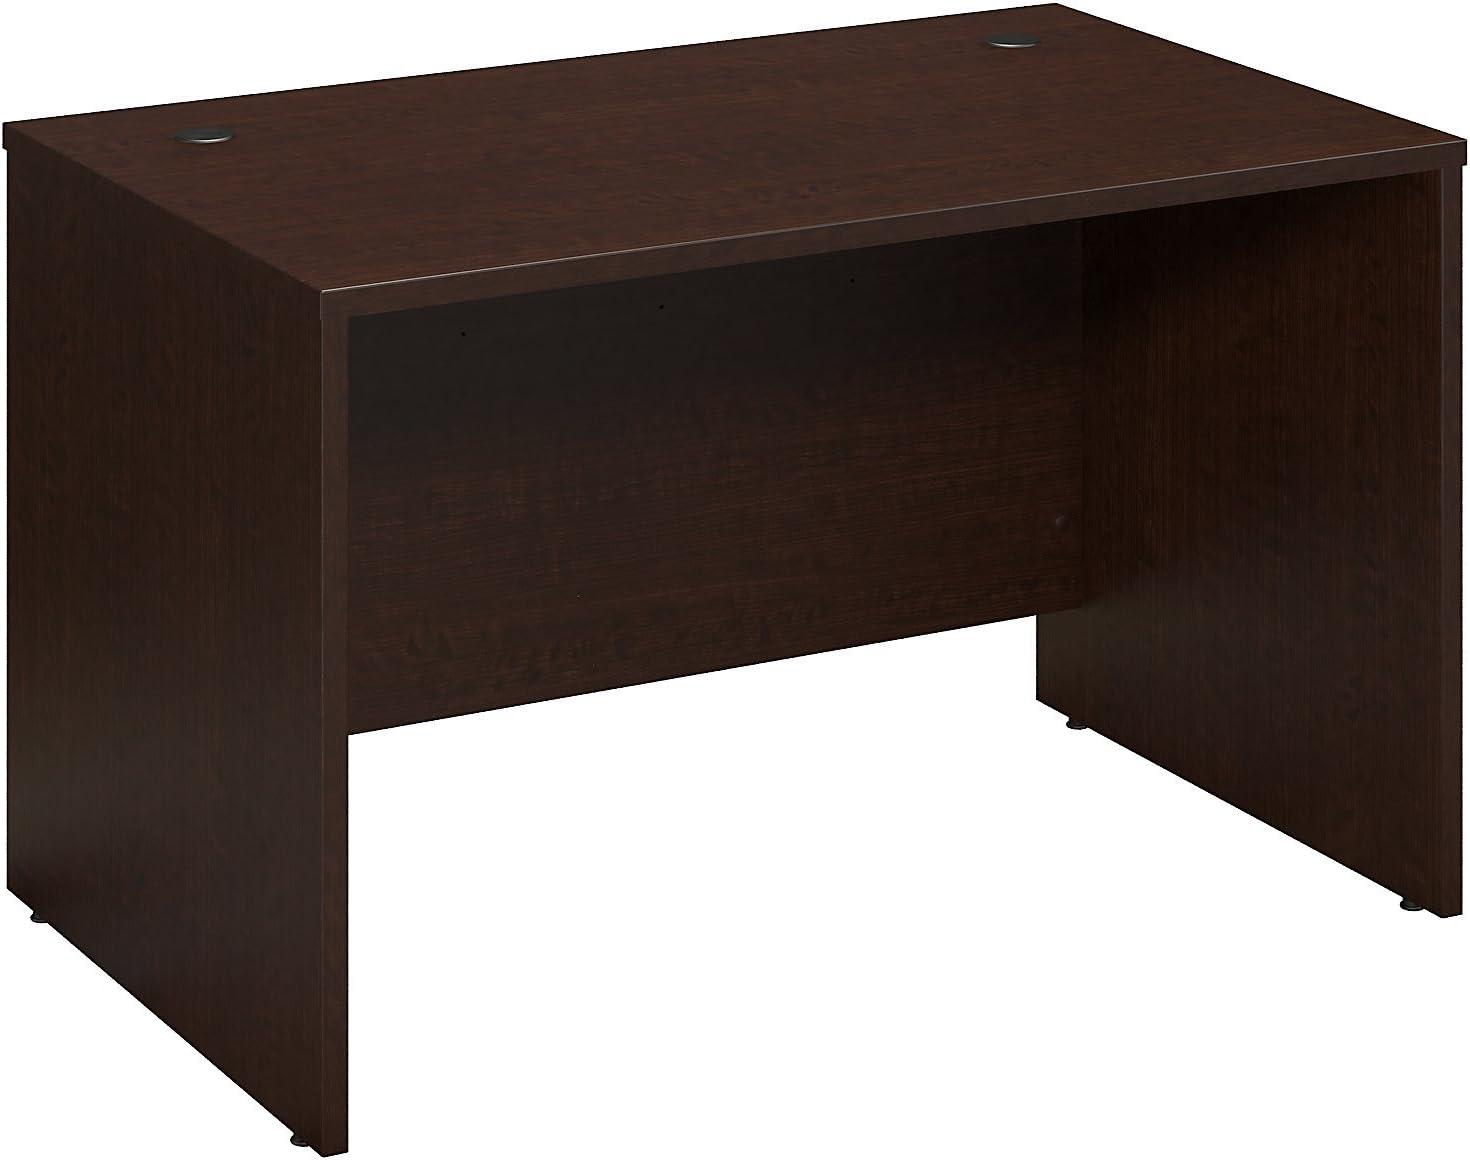 Bush Business Furniture Series C 48W x 30D Shell Desk in Mocha Cherry